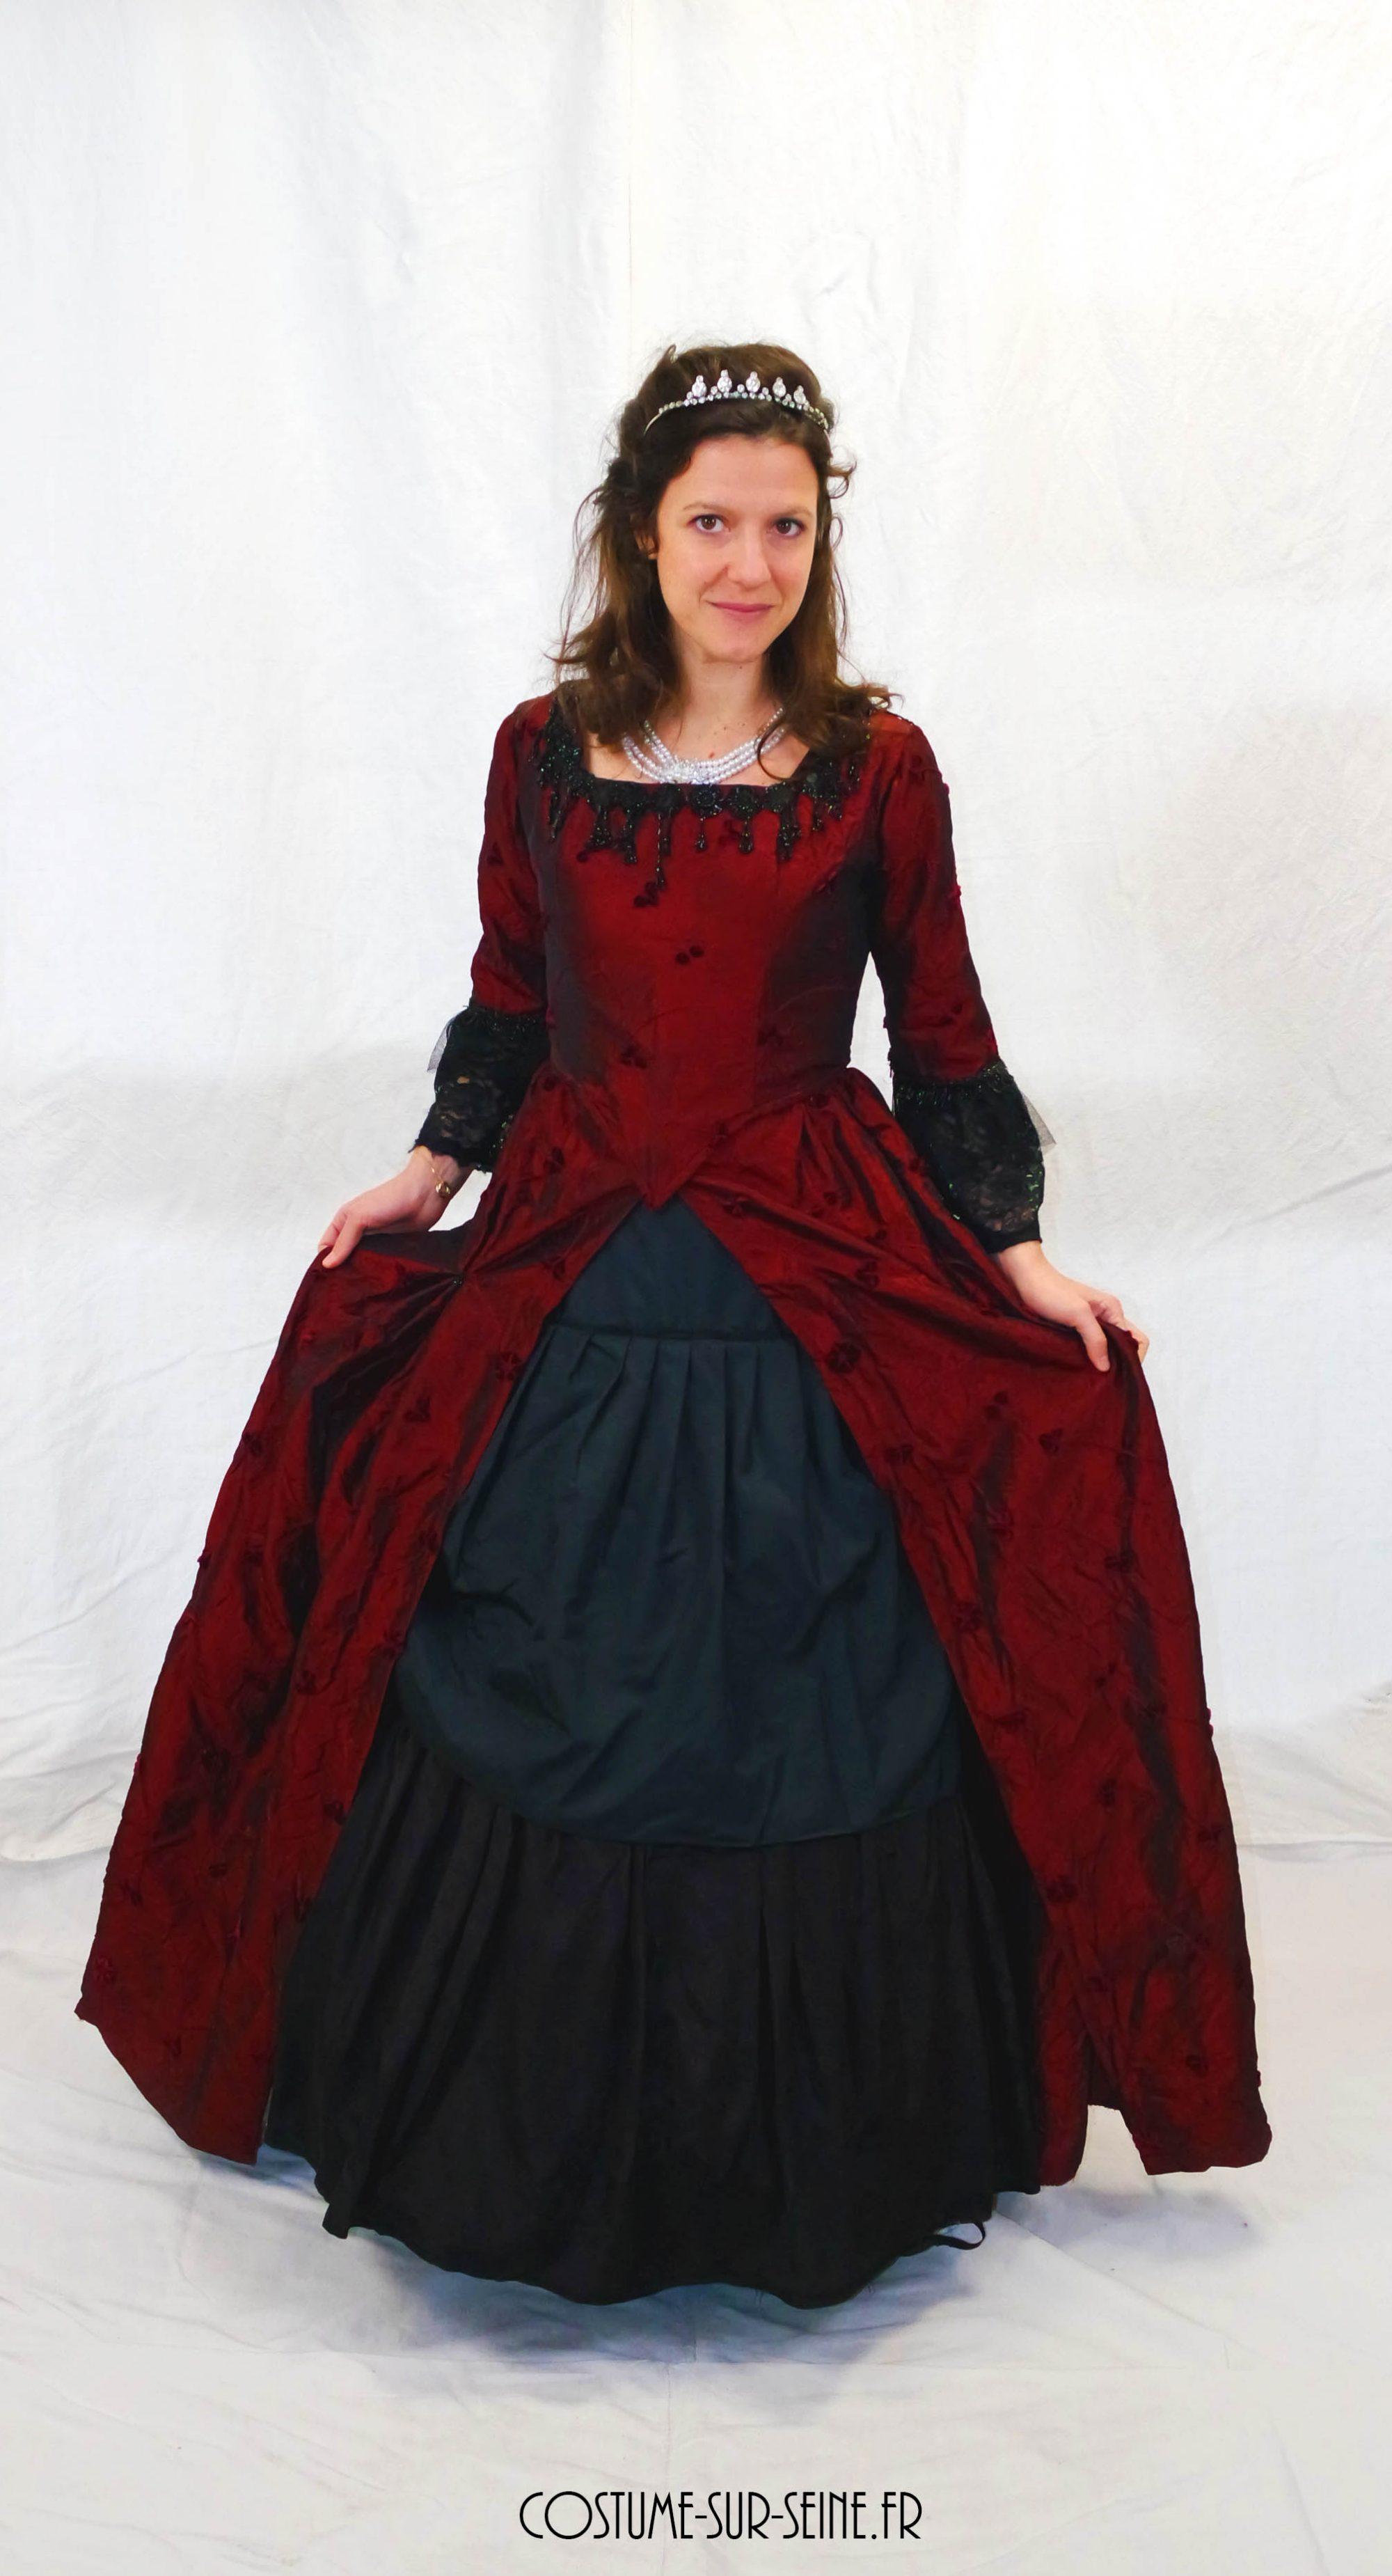 robe XVIIIe rouge et noir révérence